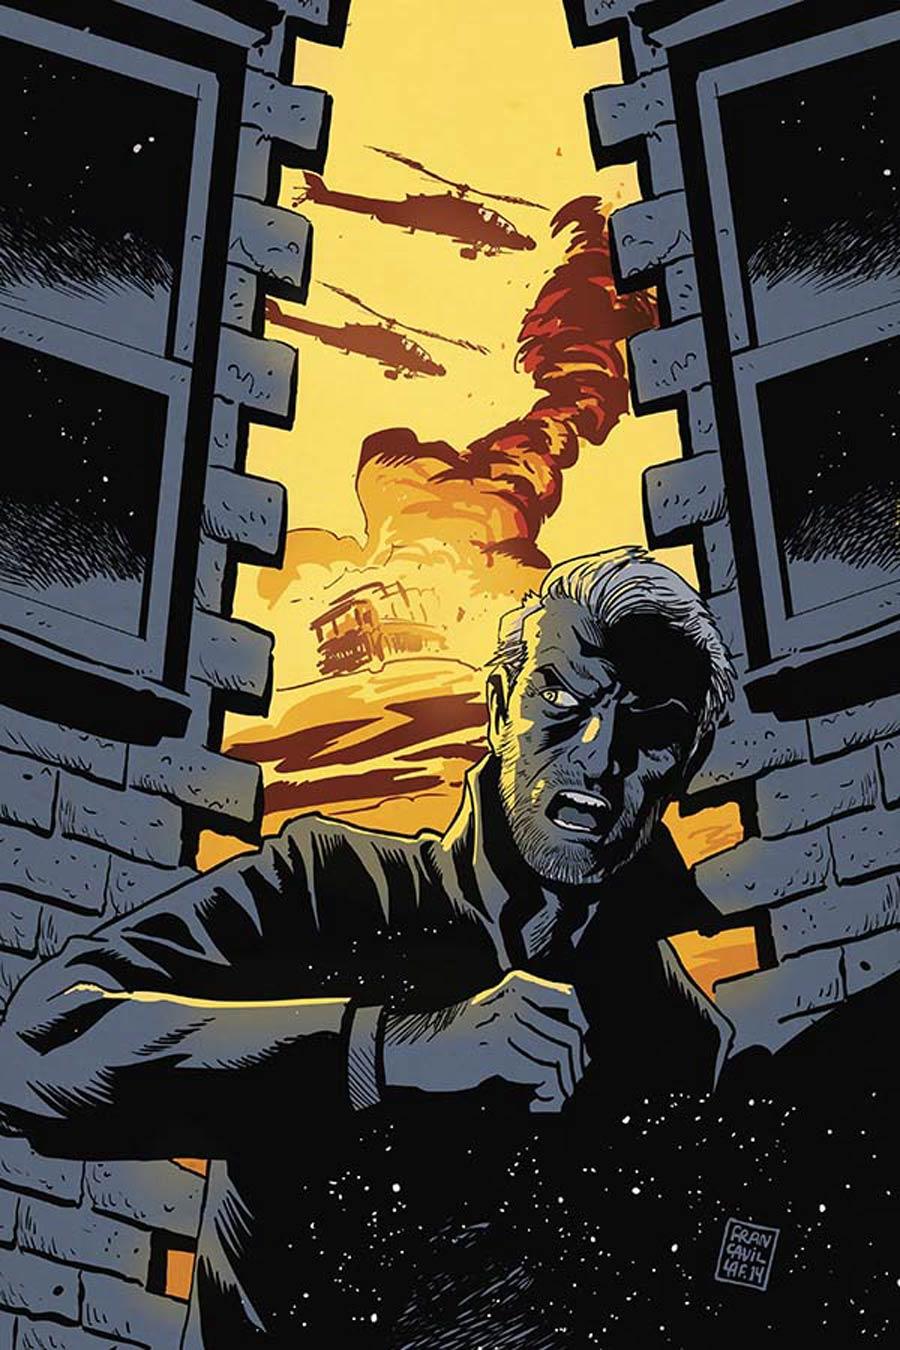 Twilight Zone Vol 5 #9 Cover B Incentive Francesco Francavilla Virgin Cover